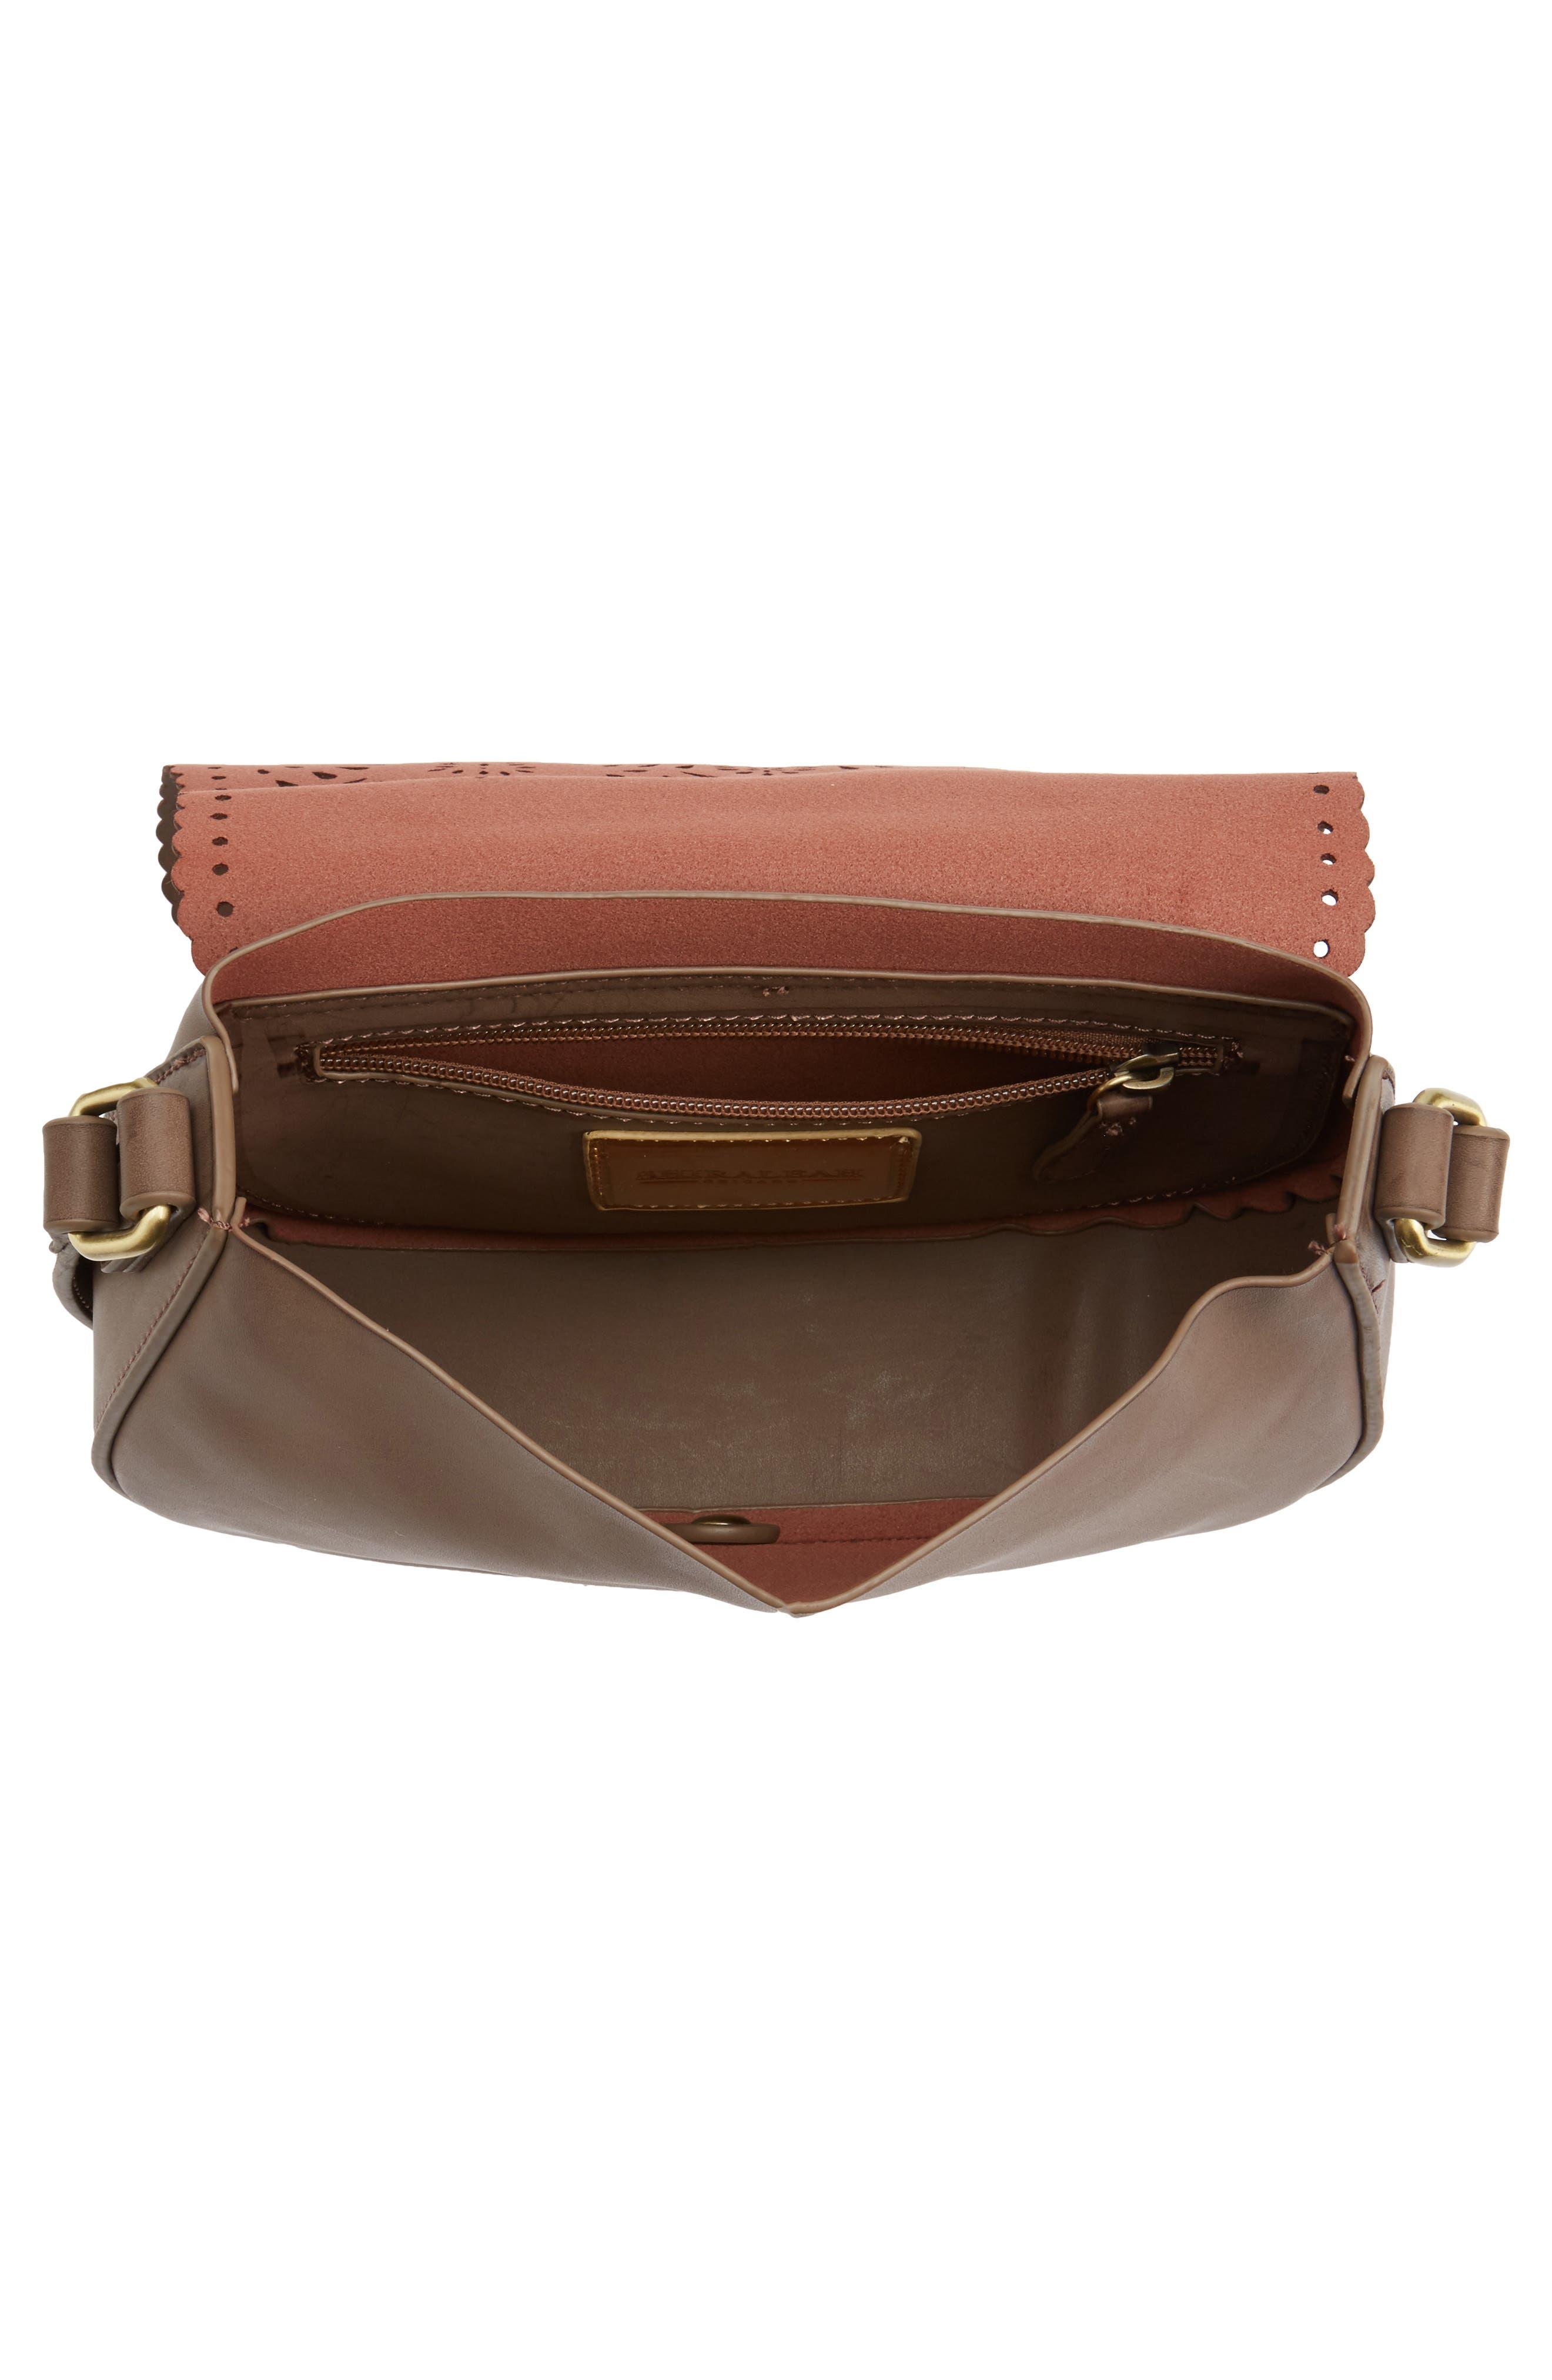 Dakota Faux Leather Saddle Bag,                             Alternate thumbnail 4, color,                             022